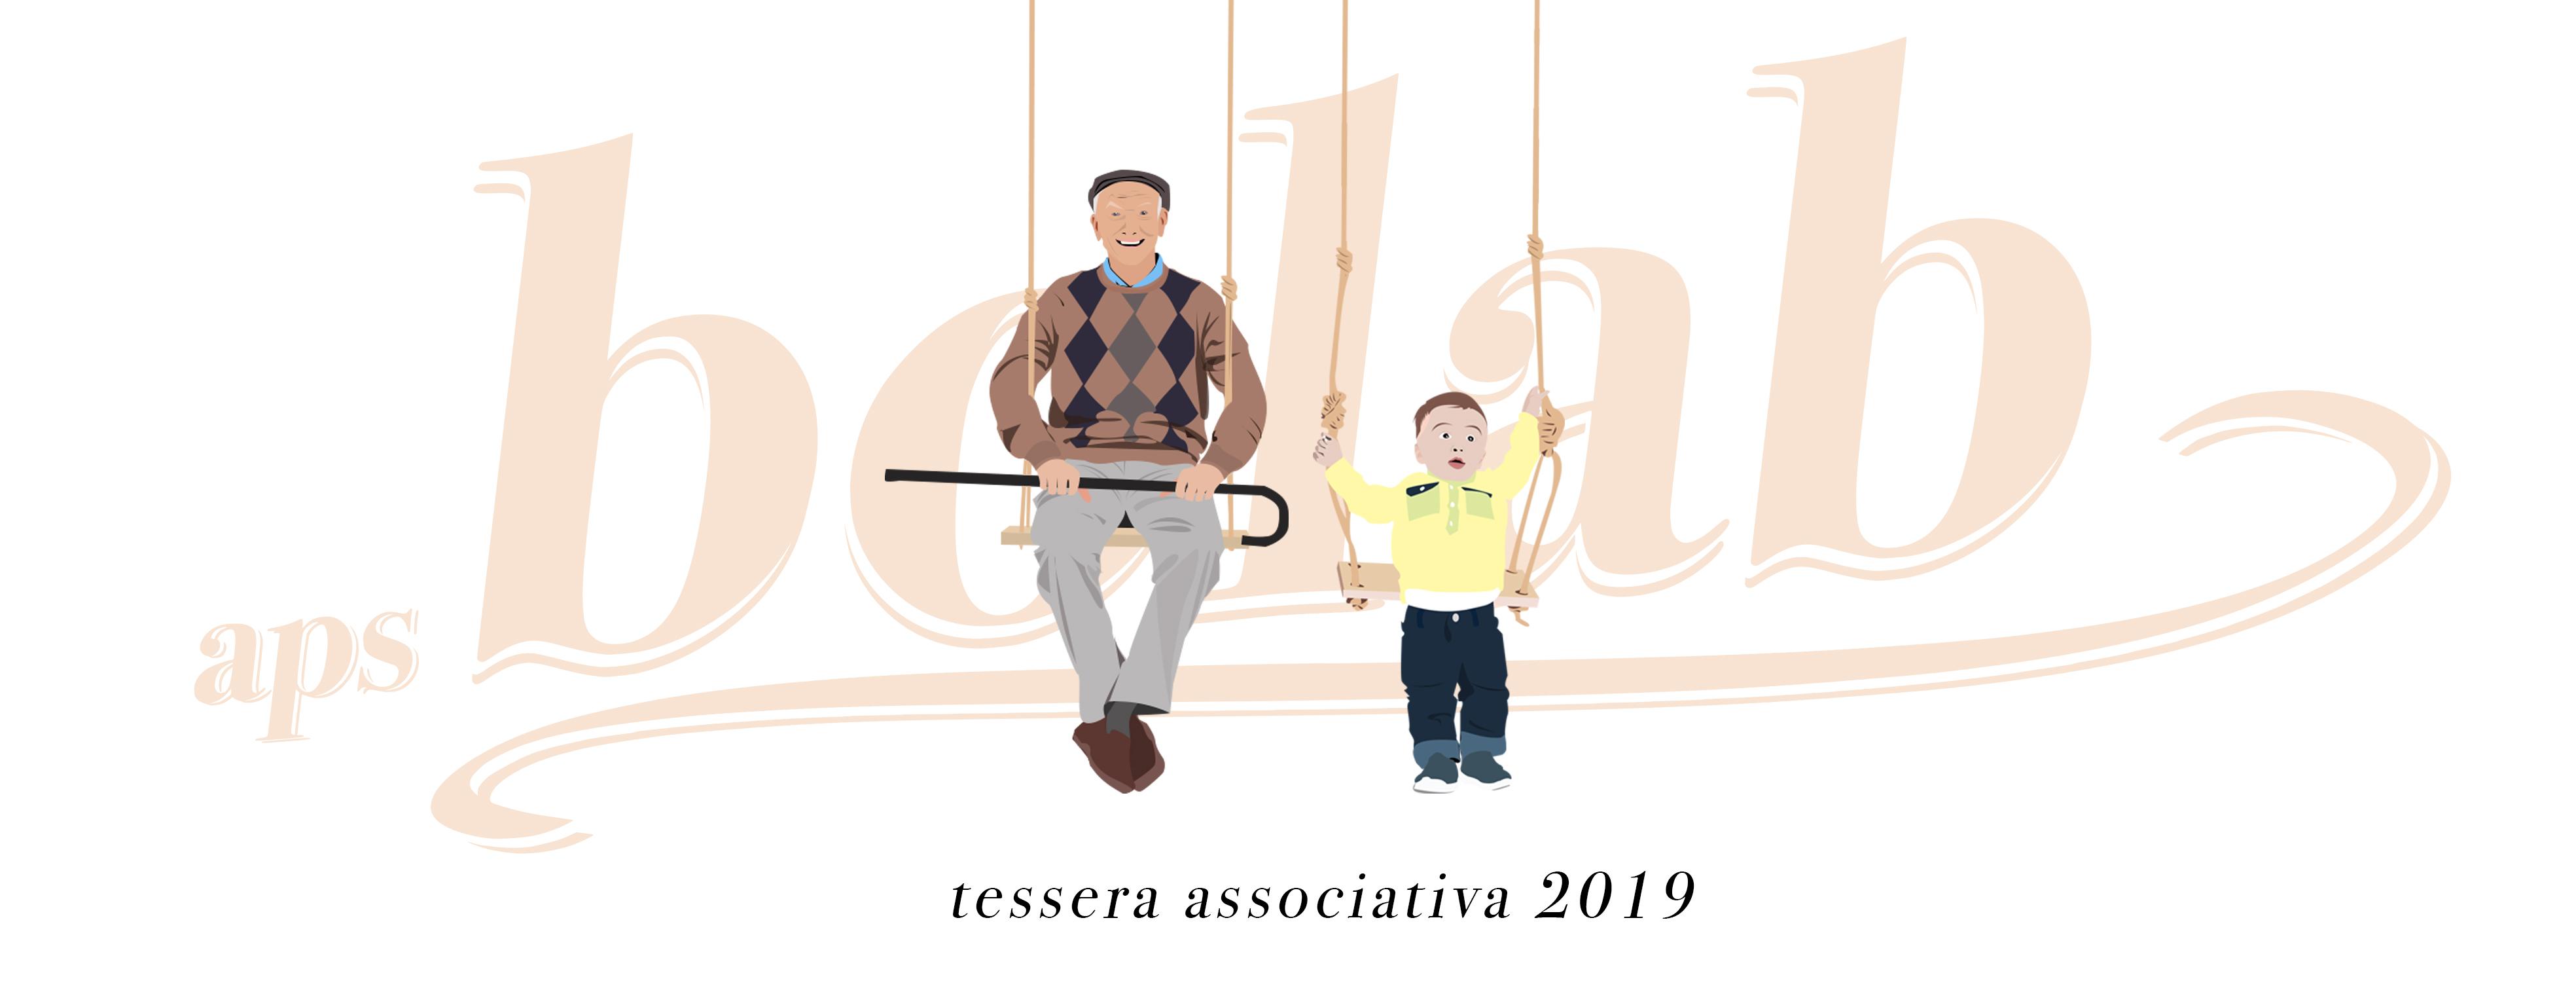 tessera associativa anno 2019 Aps Bolab